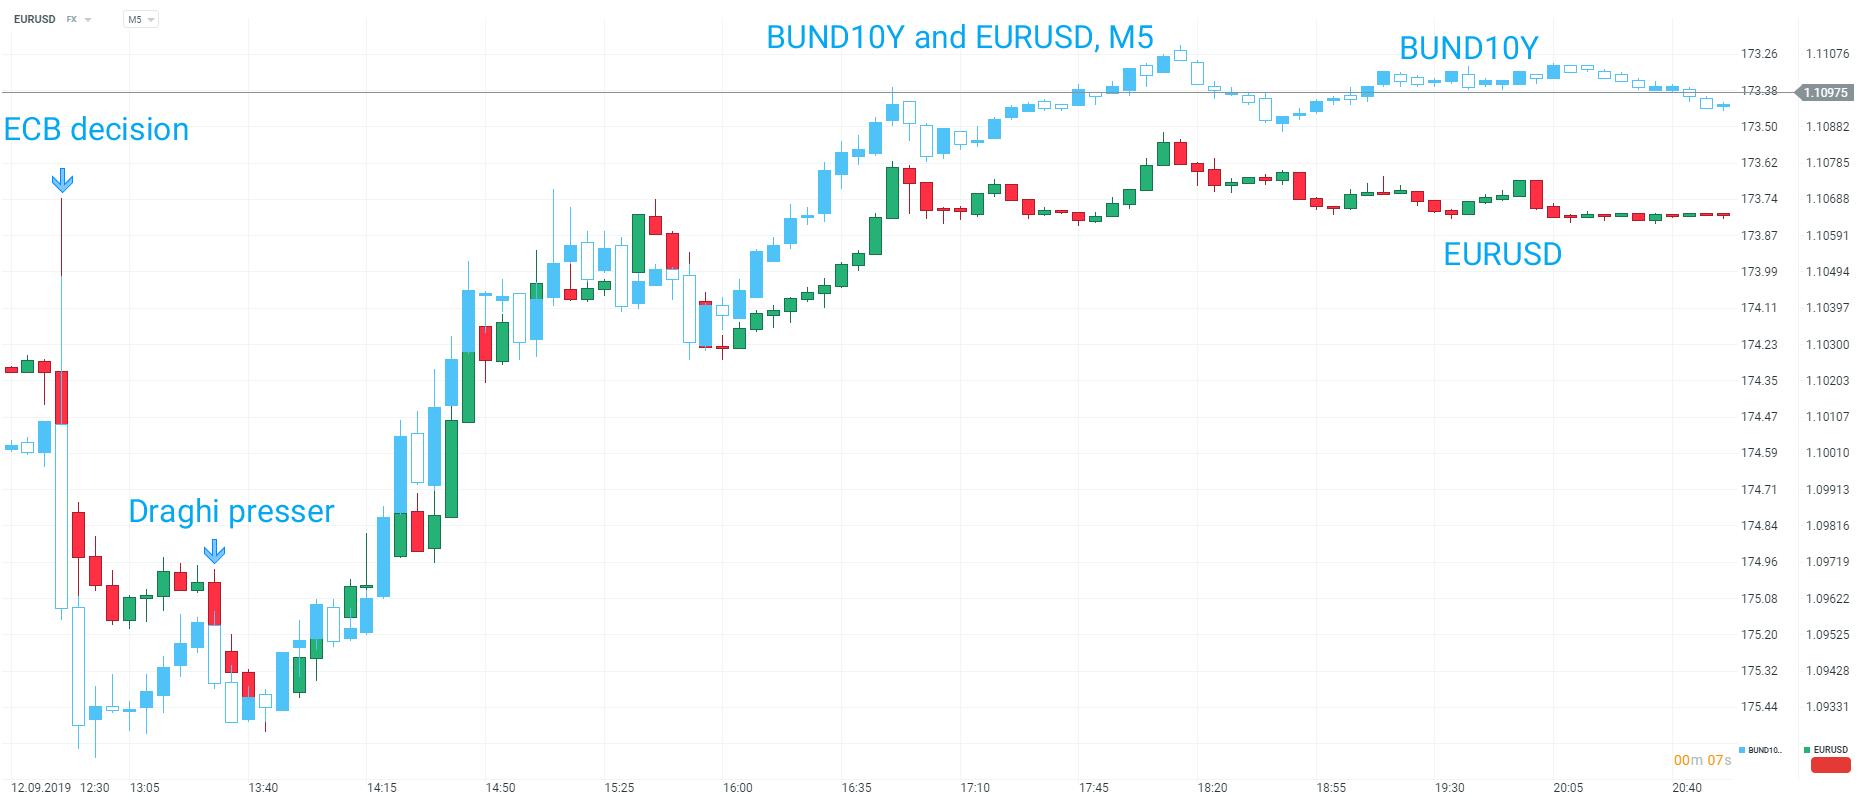 10 Yr Bund / EURUSD